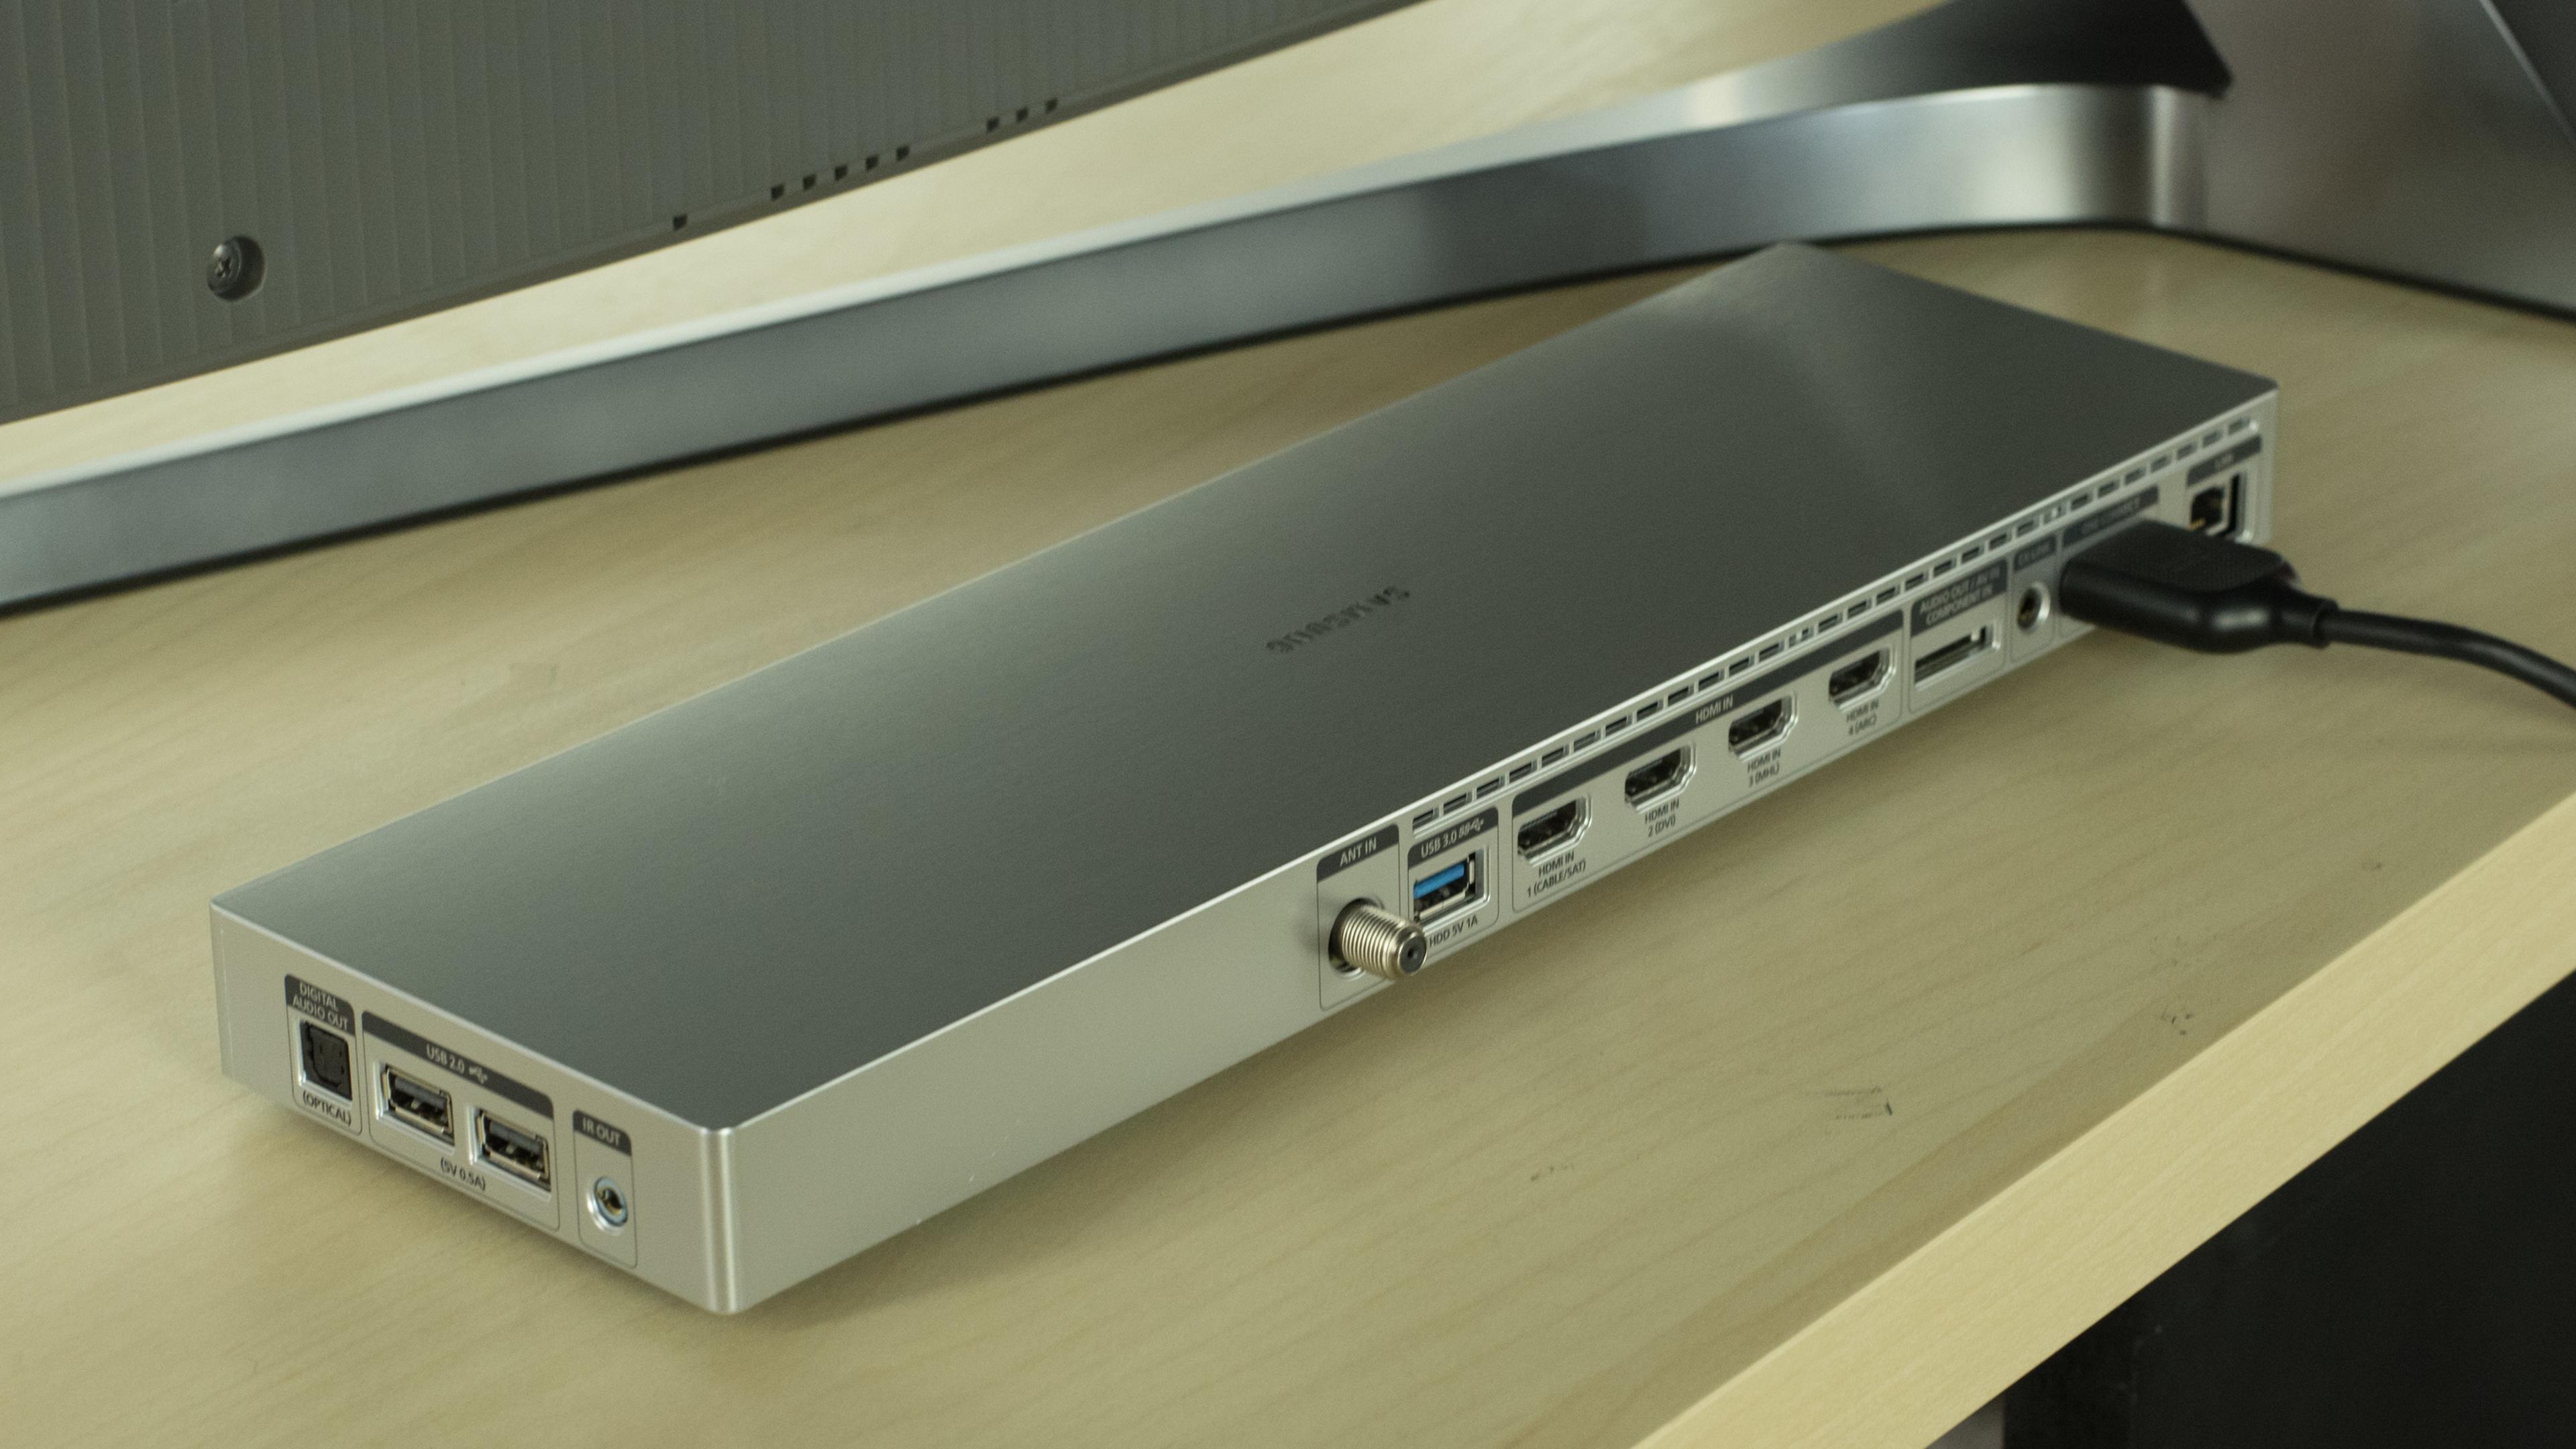 Samsung Js9000 Review Un48js9000 Un55js9000 Un65js9000